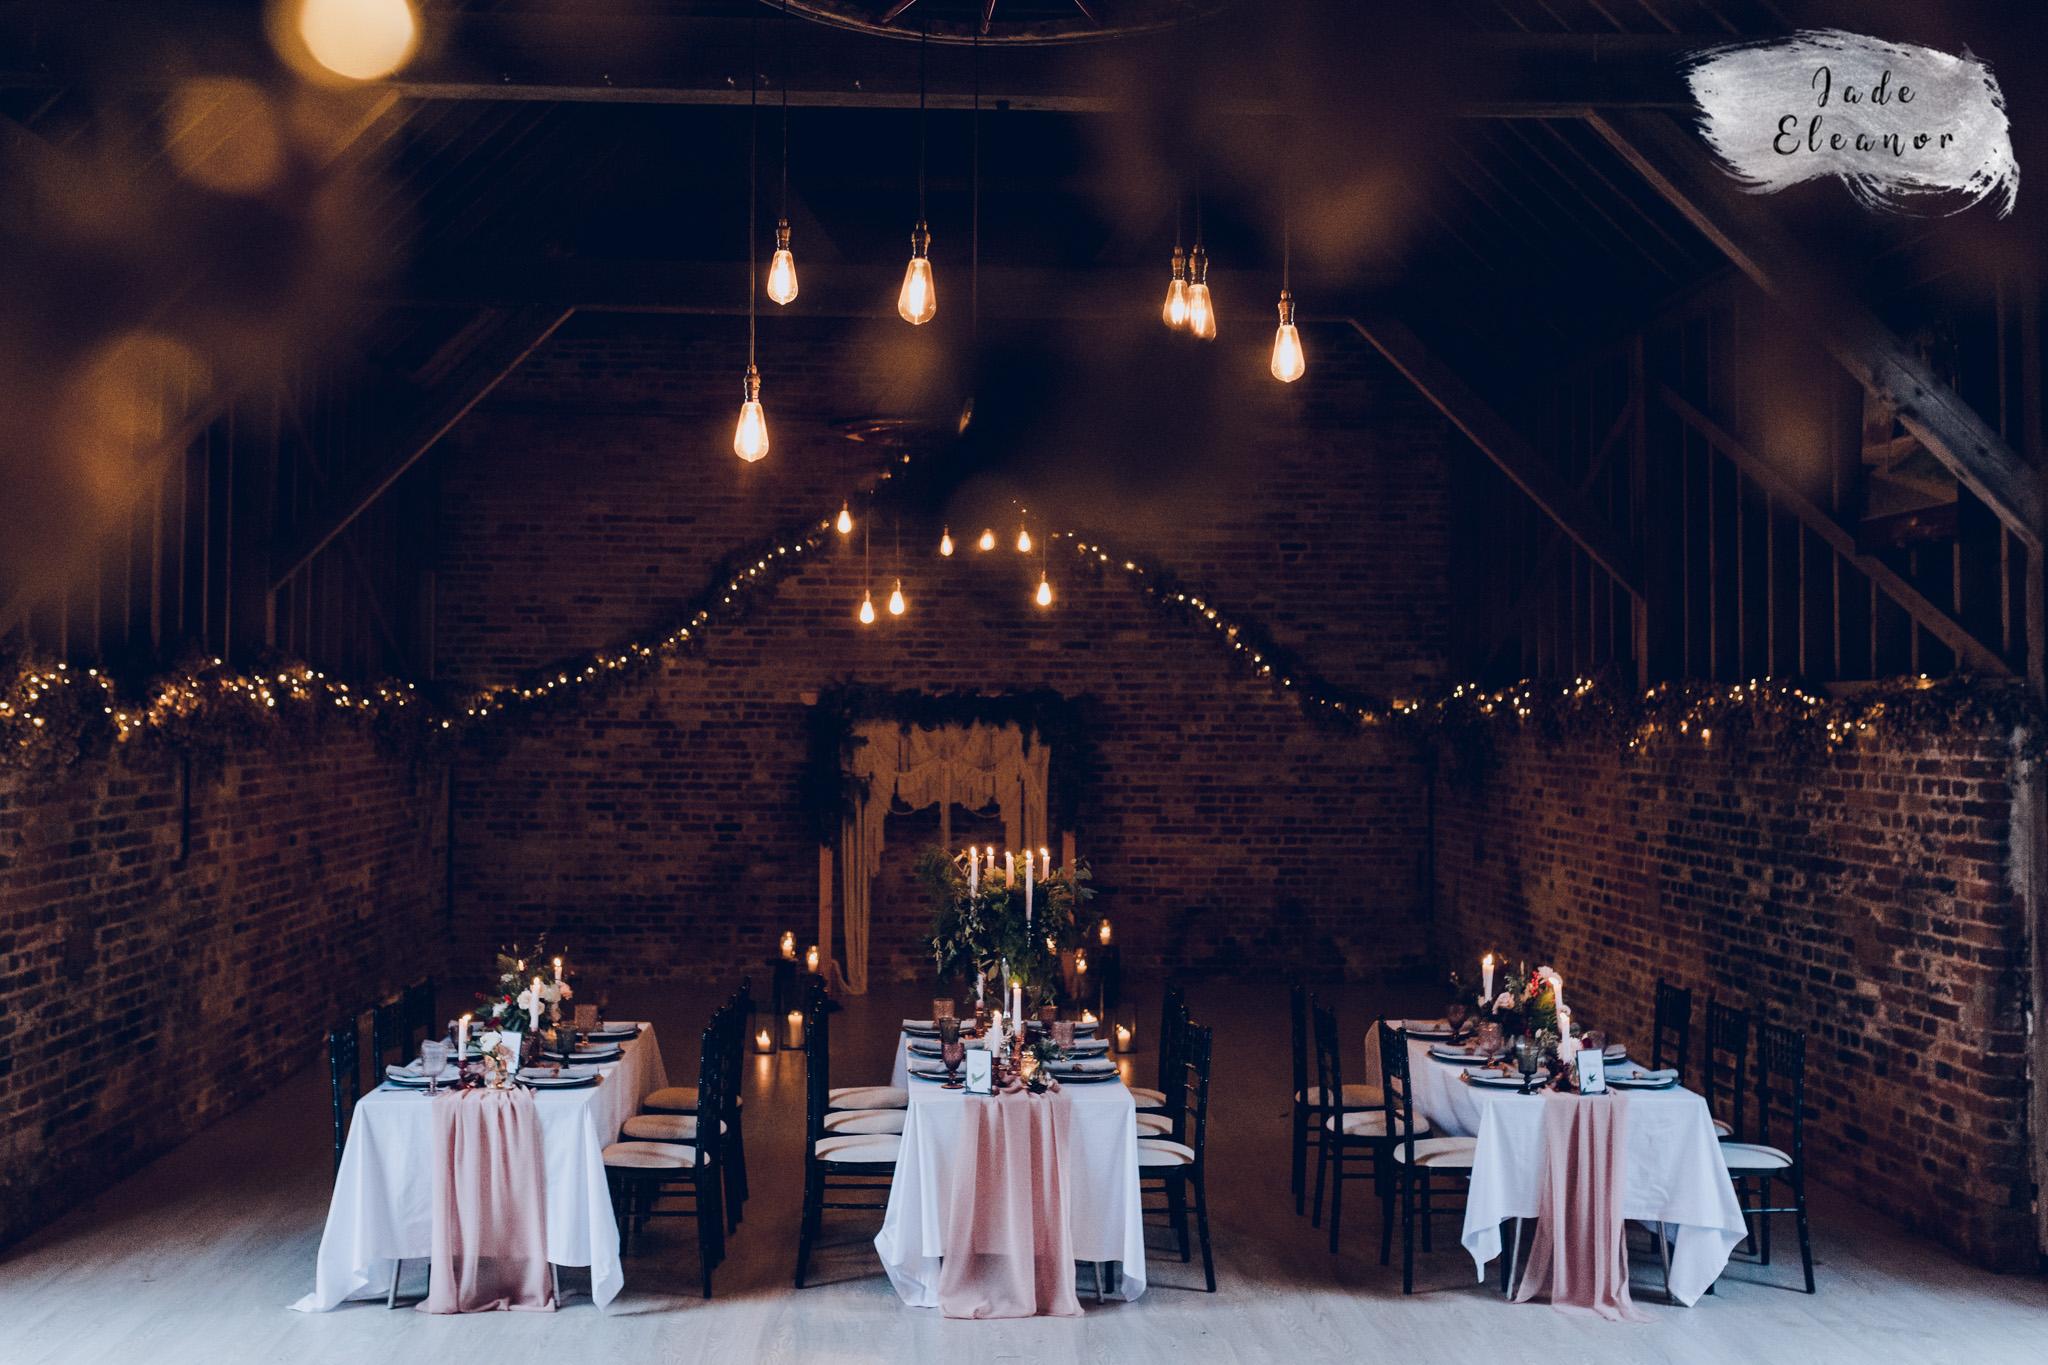 Bysshe Court Barn Wedding Jade Eleanor Photography-36.jpg